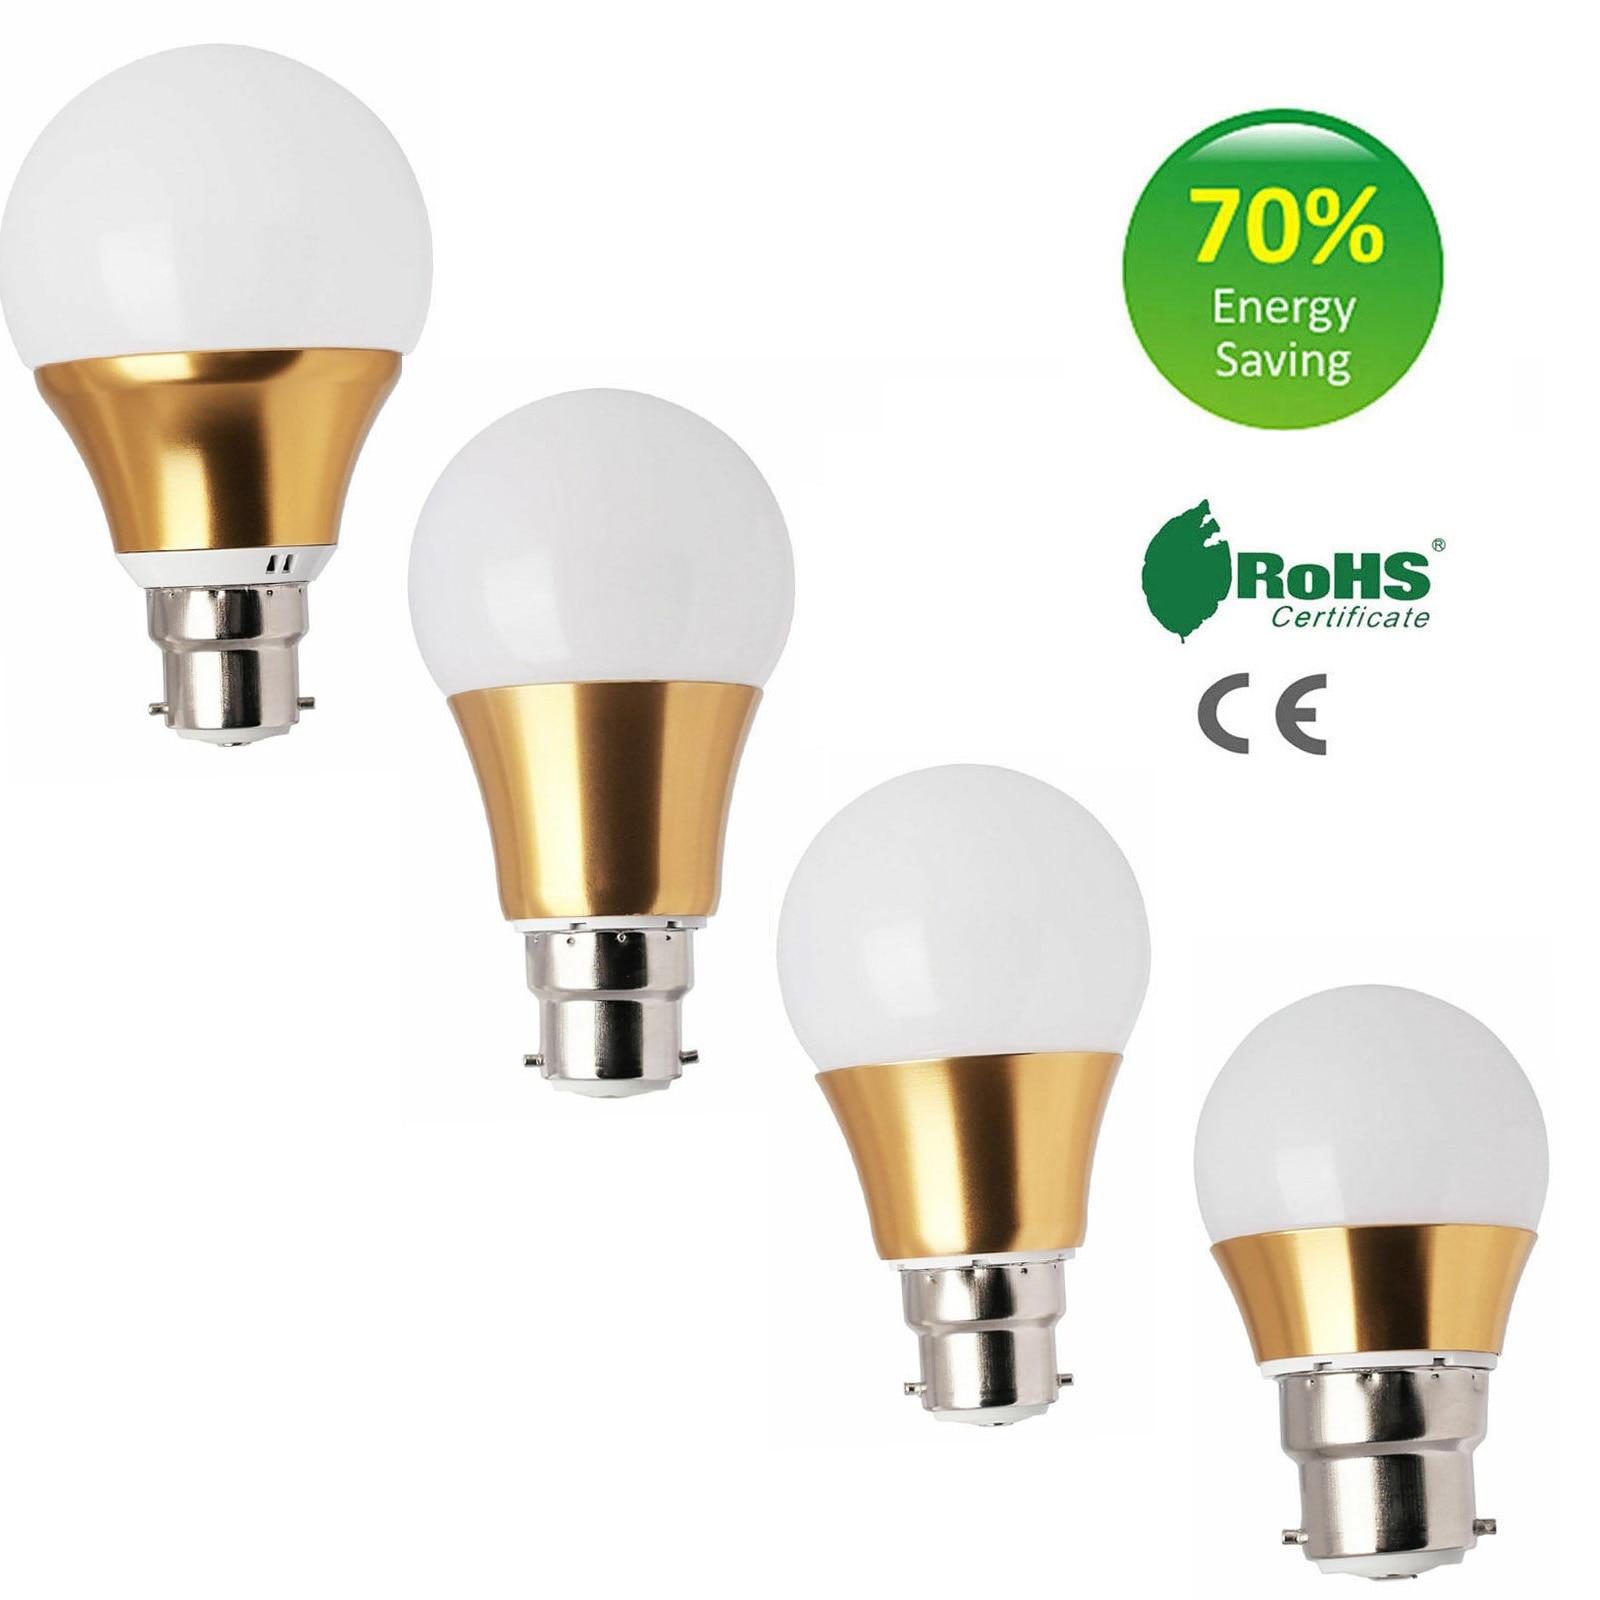 3W 5W 7W 9W Dimmable LED Globe Bulbs B22 BC Bayonet Light AC 220V Lamps For Chandeliers Energy Saving Light Bombillas Bulb Lamps